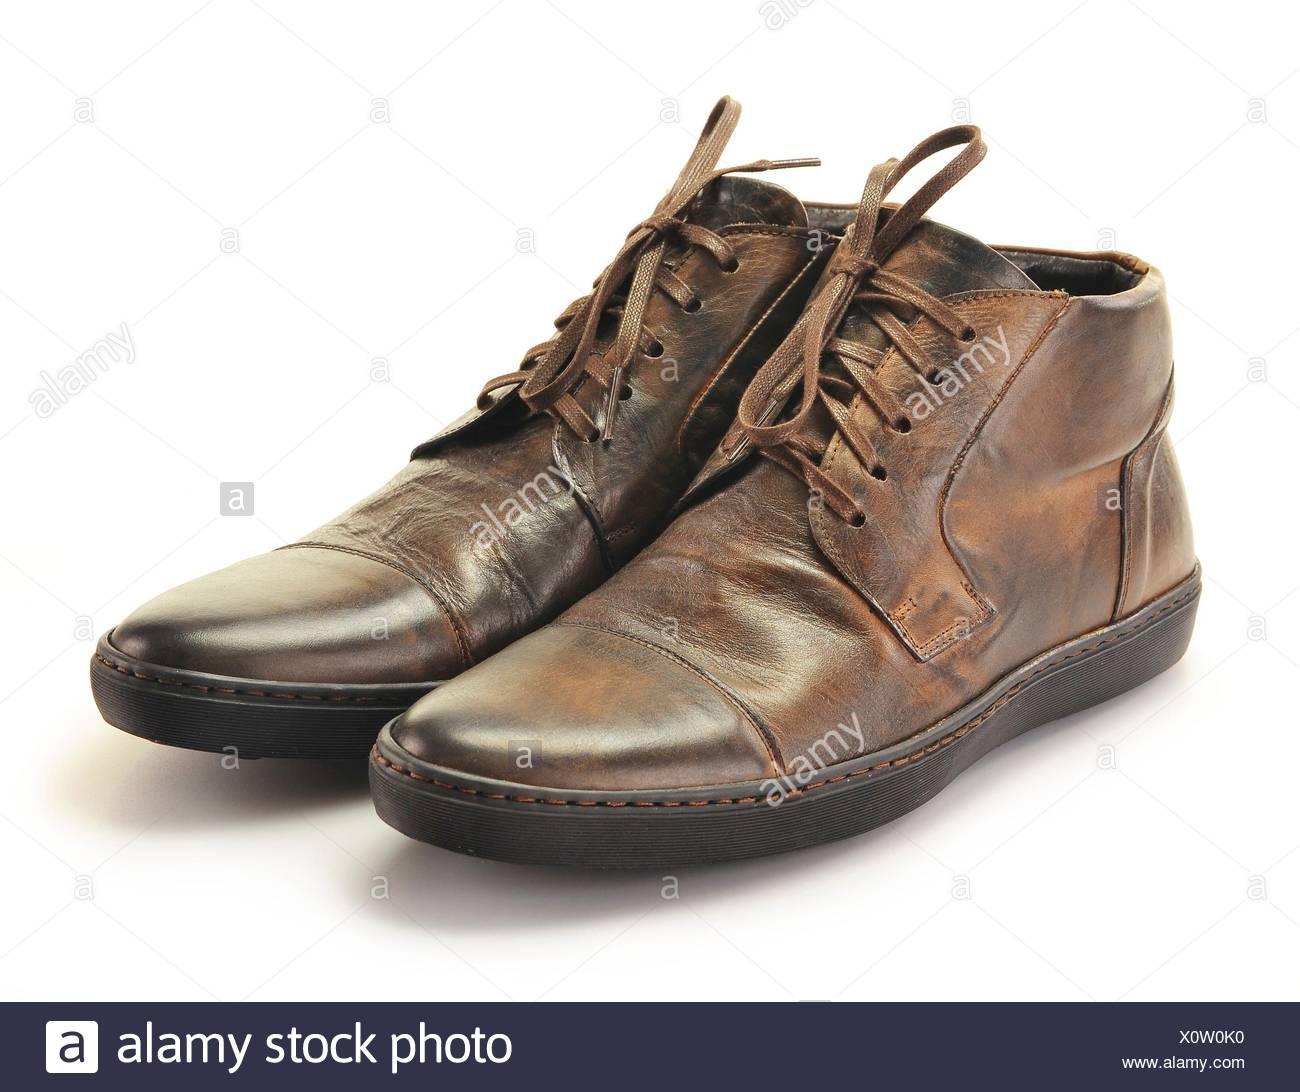 offizieller Shop bieten viel heiß seeling original S Leather Stock Photos & S Leather Stock Images - Alamy